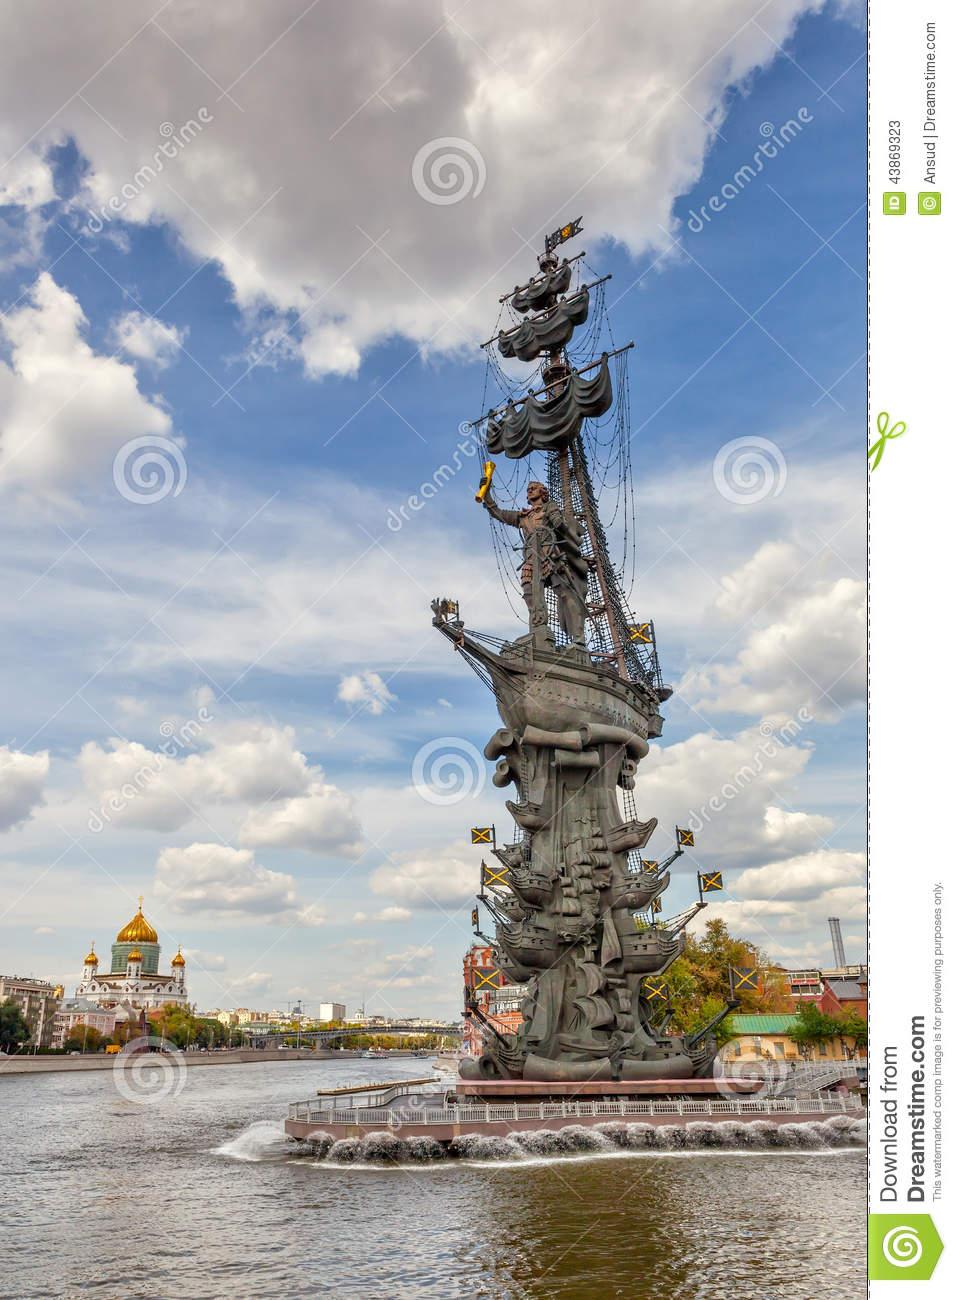 Peter The Great Statue By Zurab Tsereteli Editorial Stock Photo.